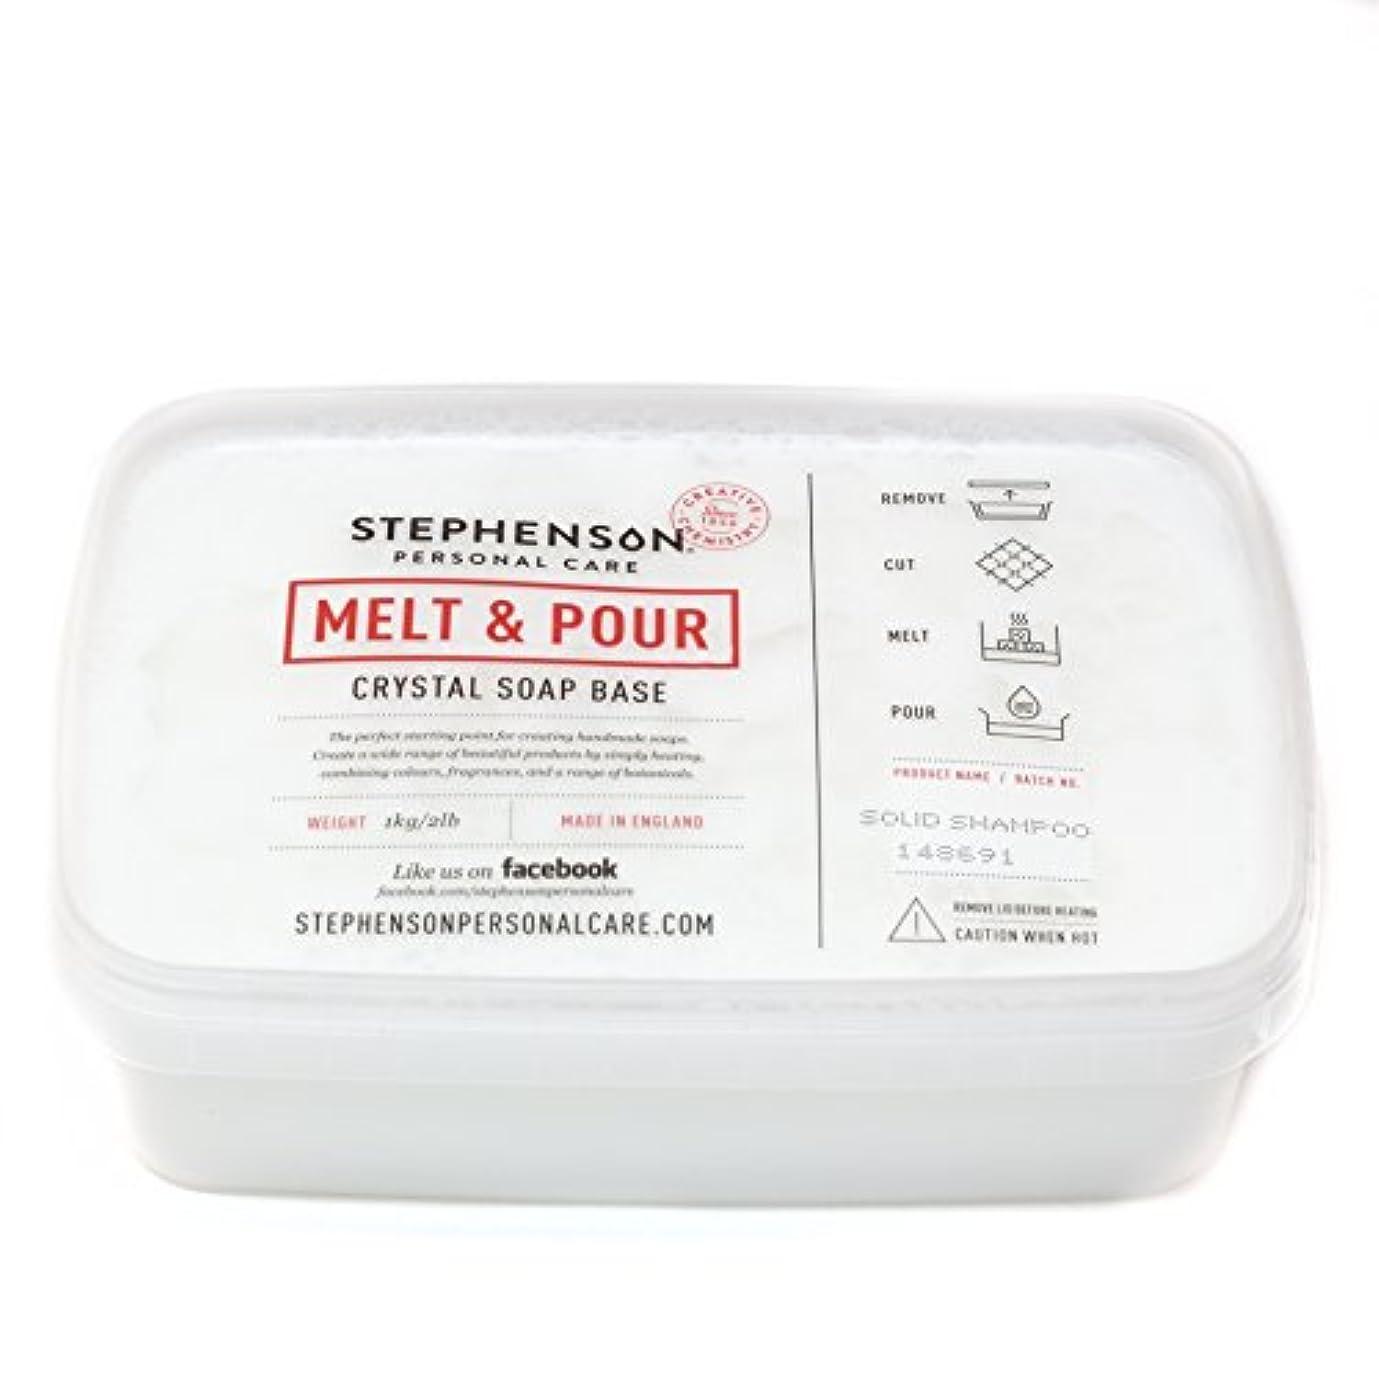 Melt and Pour Soap Base - Solid Shampoo SLS FREE - 1Kg